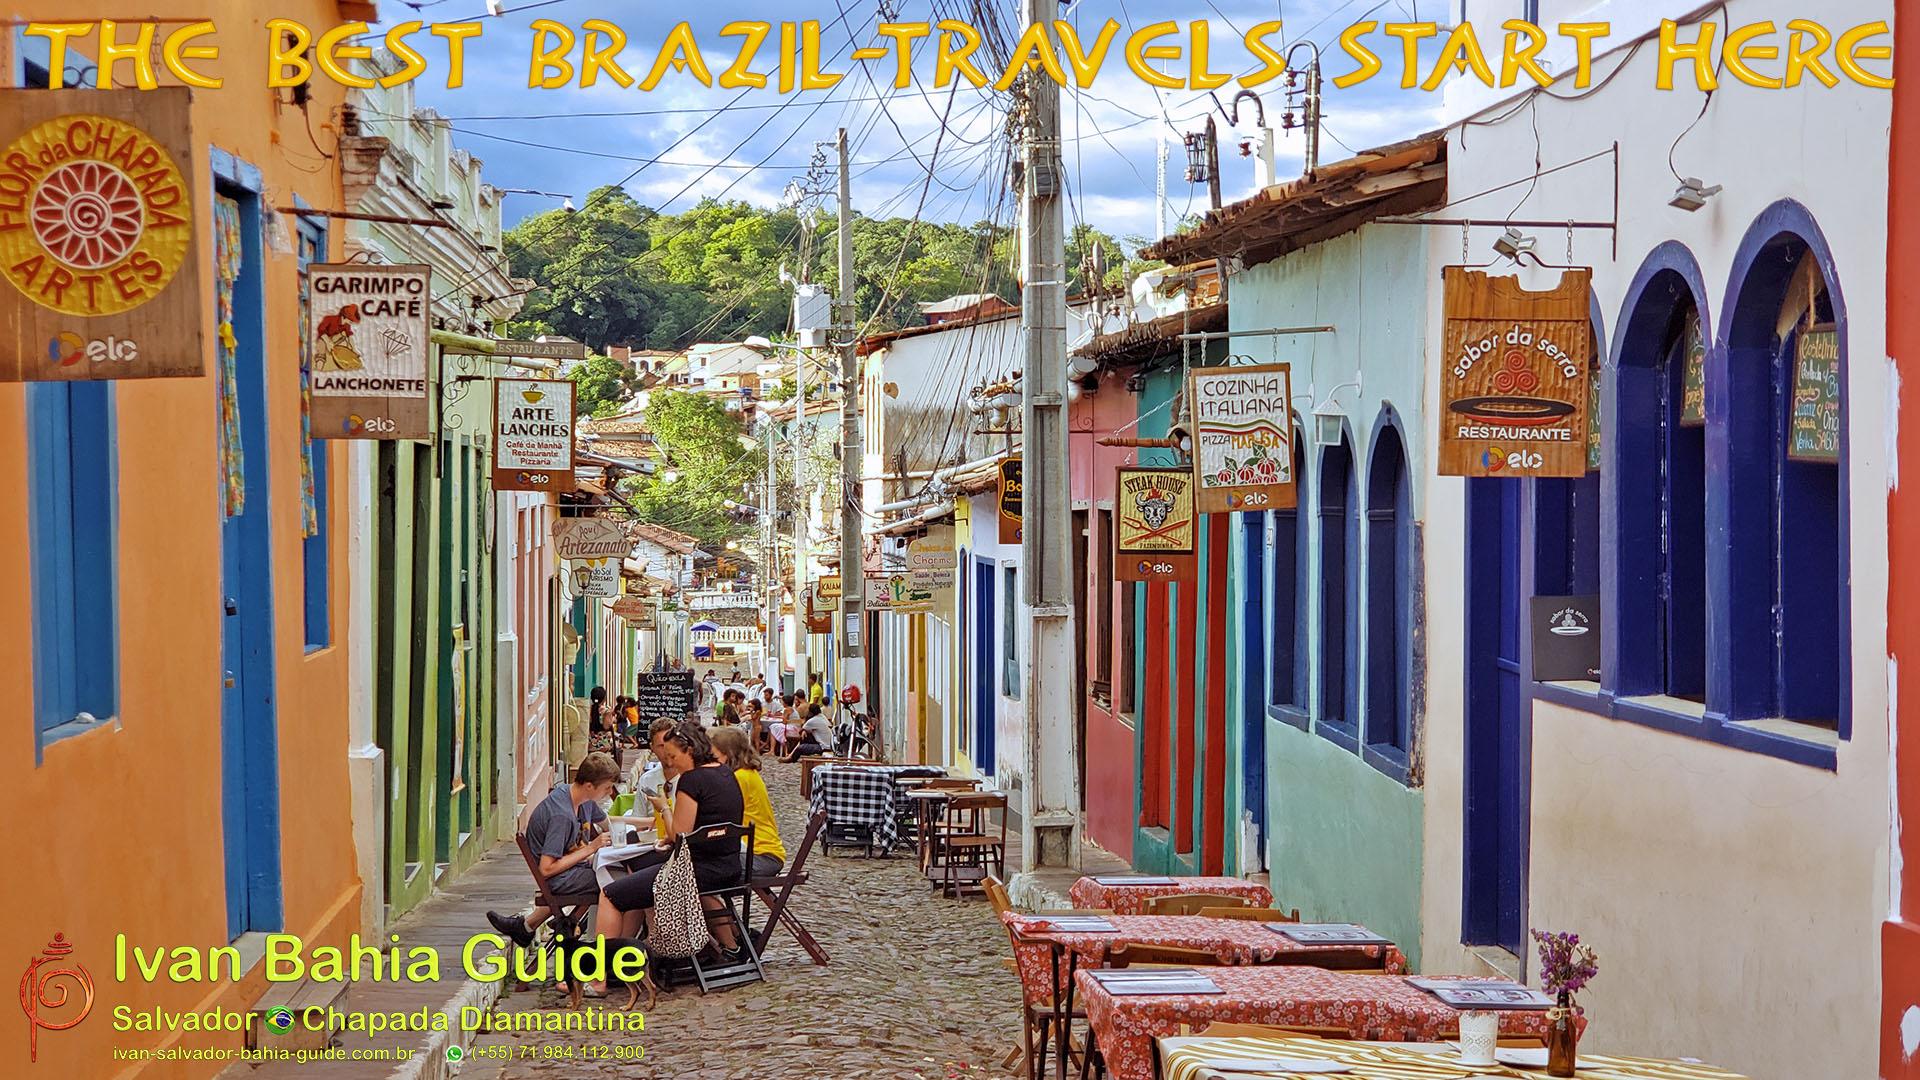 day-tour / visit Salvador da Bahia from your cruise ship with Ivan Bahia private Guide, exclusive photography #ivanbahiaguide #toursbylocals @fernandobingre #bahiametisse #ssalovers #ivanbahiatravelguide #salvador